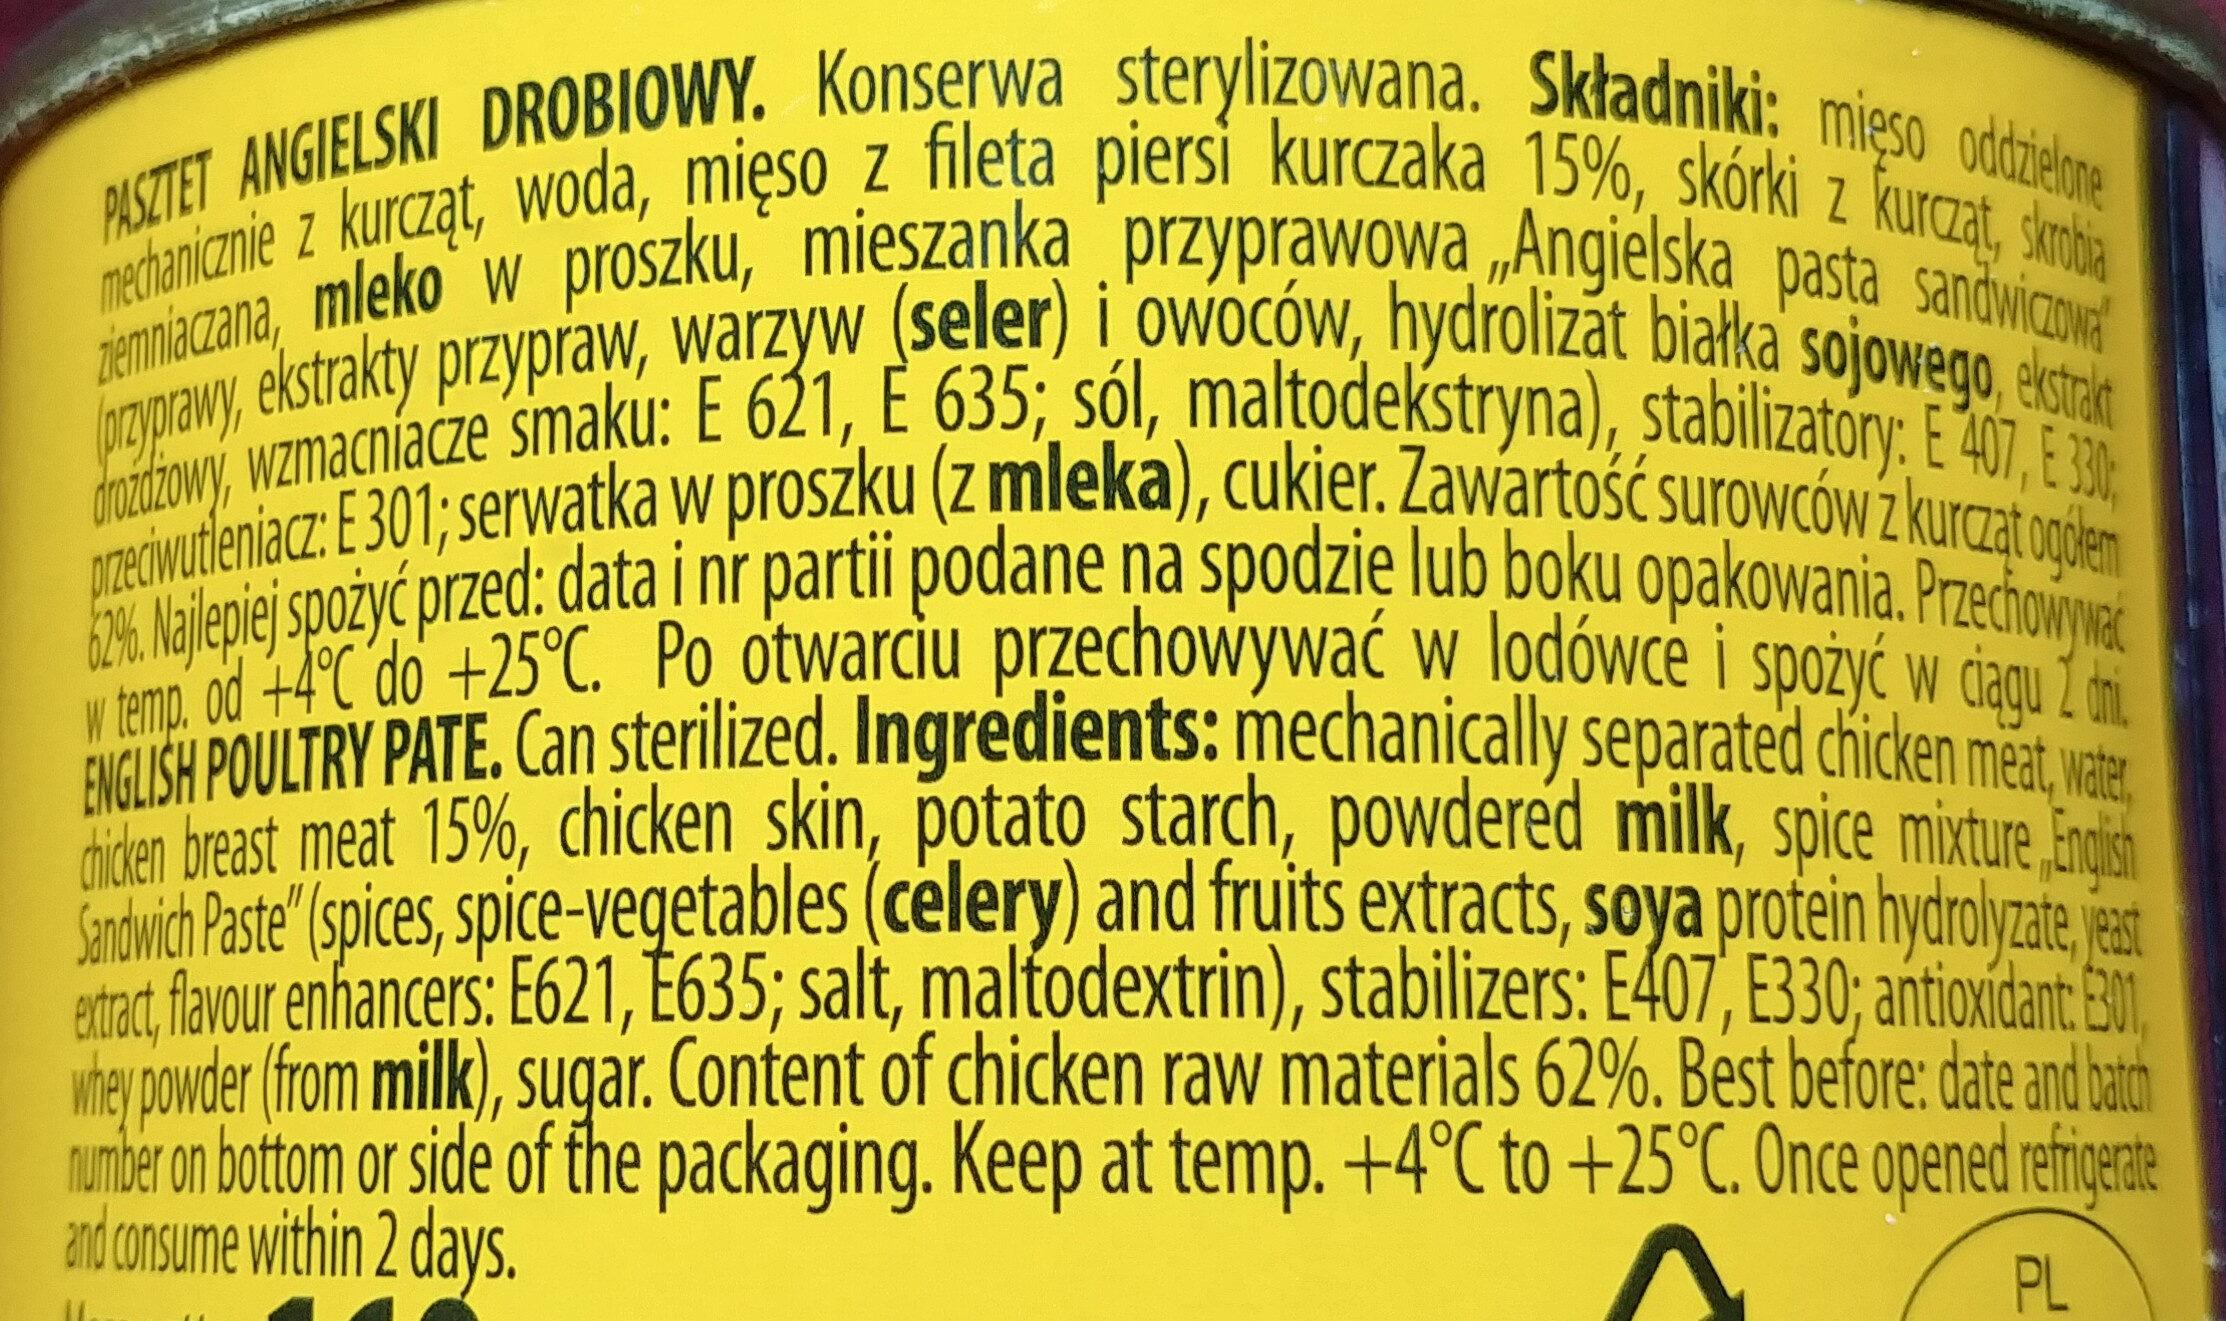 Pasztet angielski drobiowy - Ingredients - en